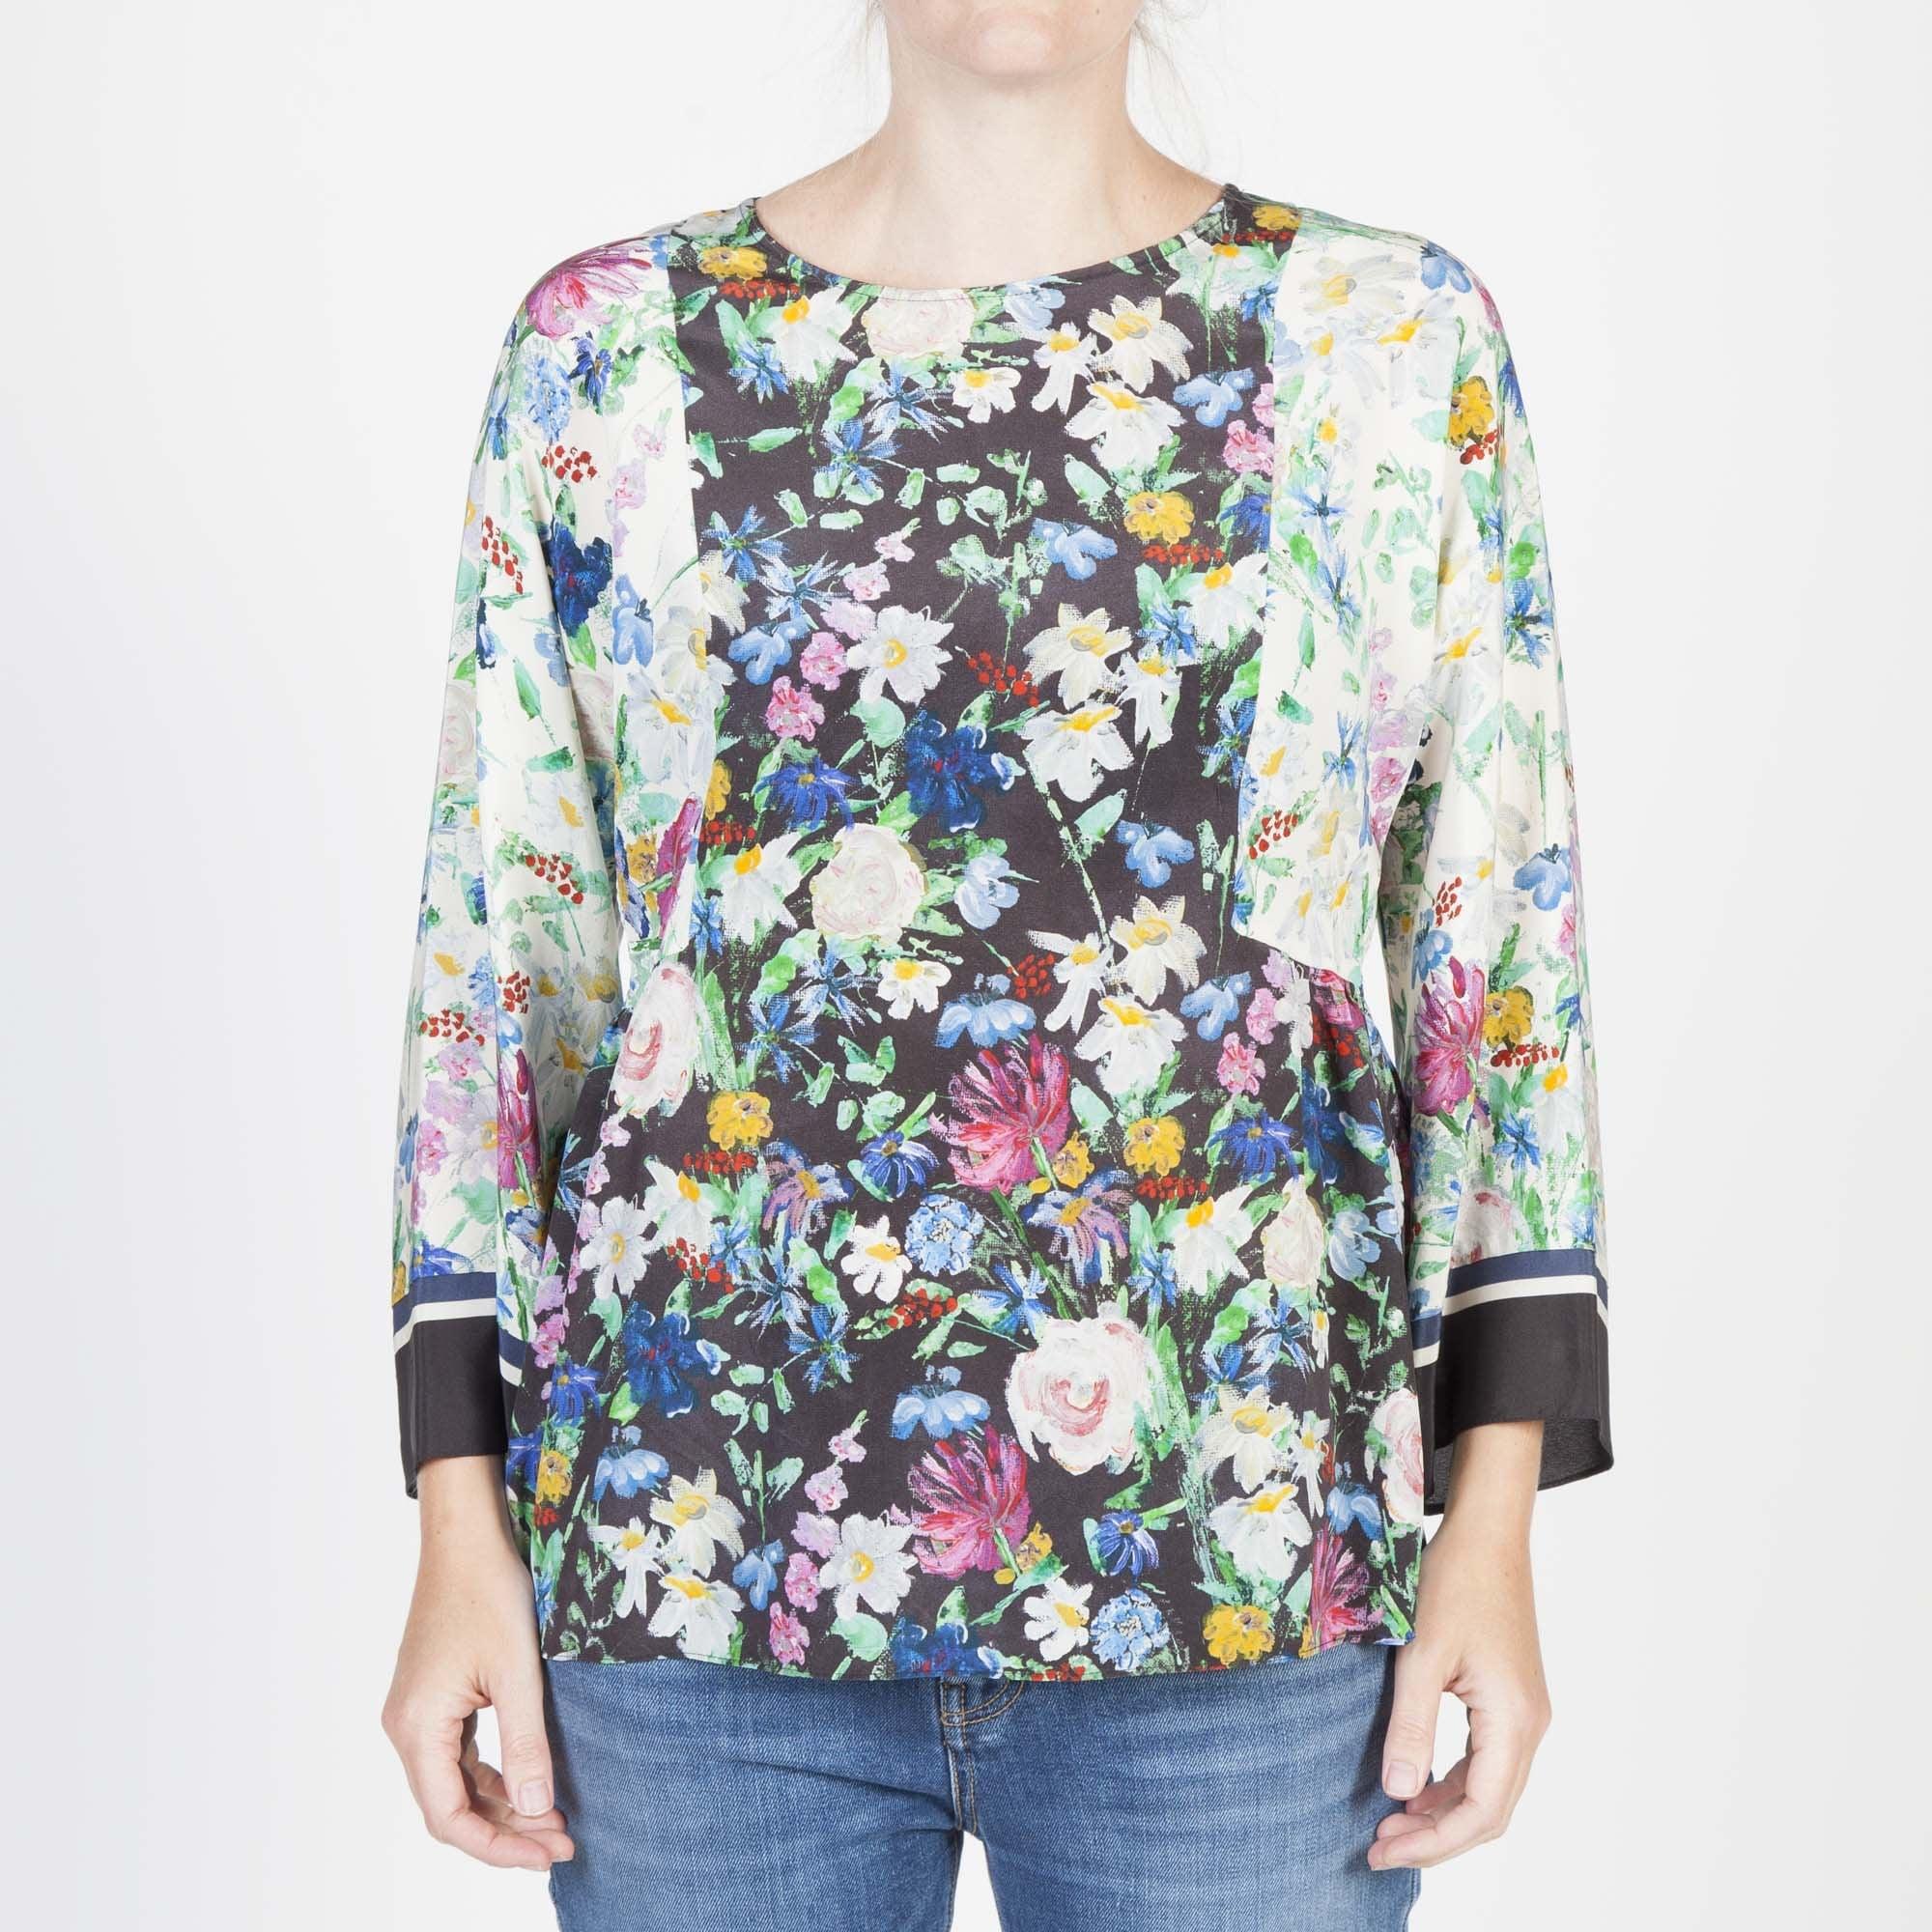 e6082d63b30 WEEKEND MAXMARA Verbas Silk Floral Print Top in Black Multi